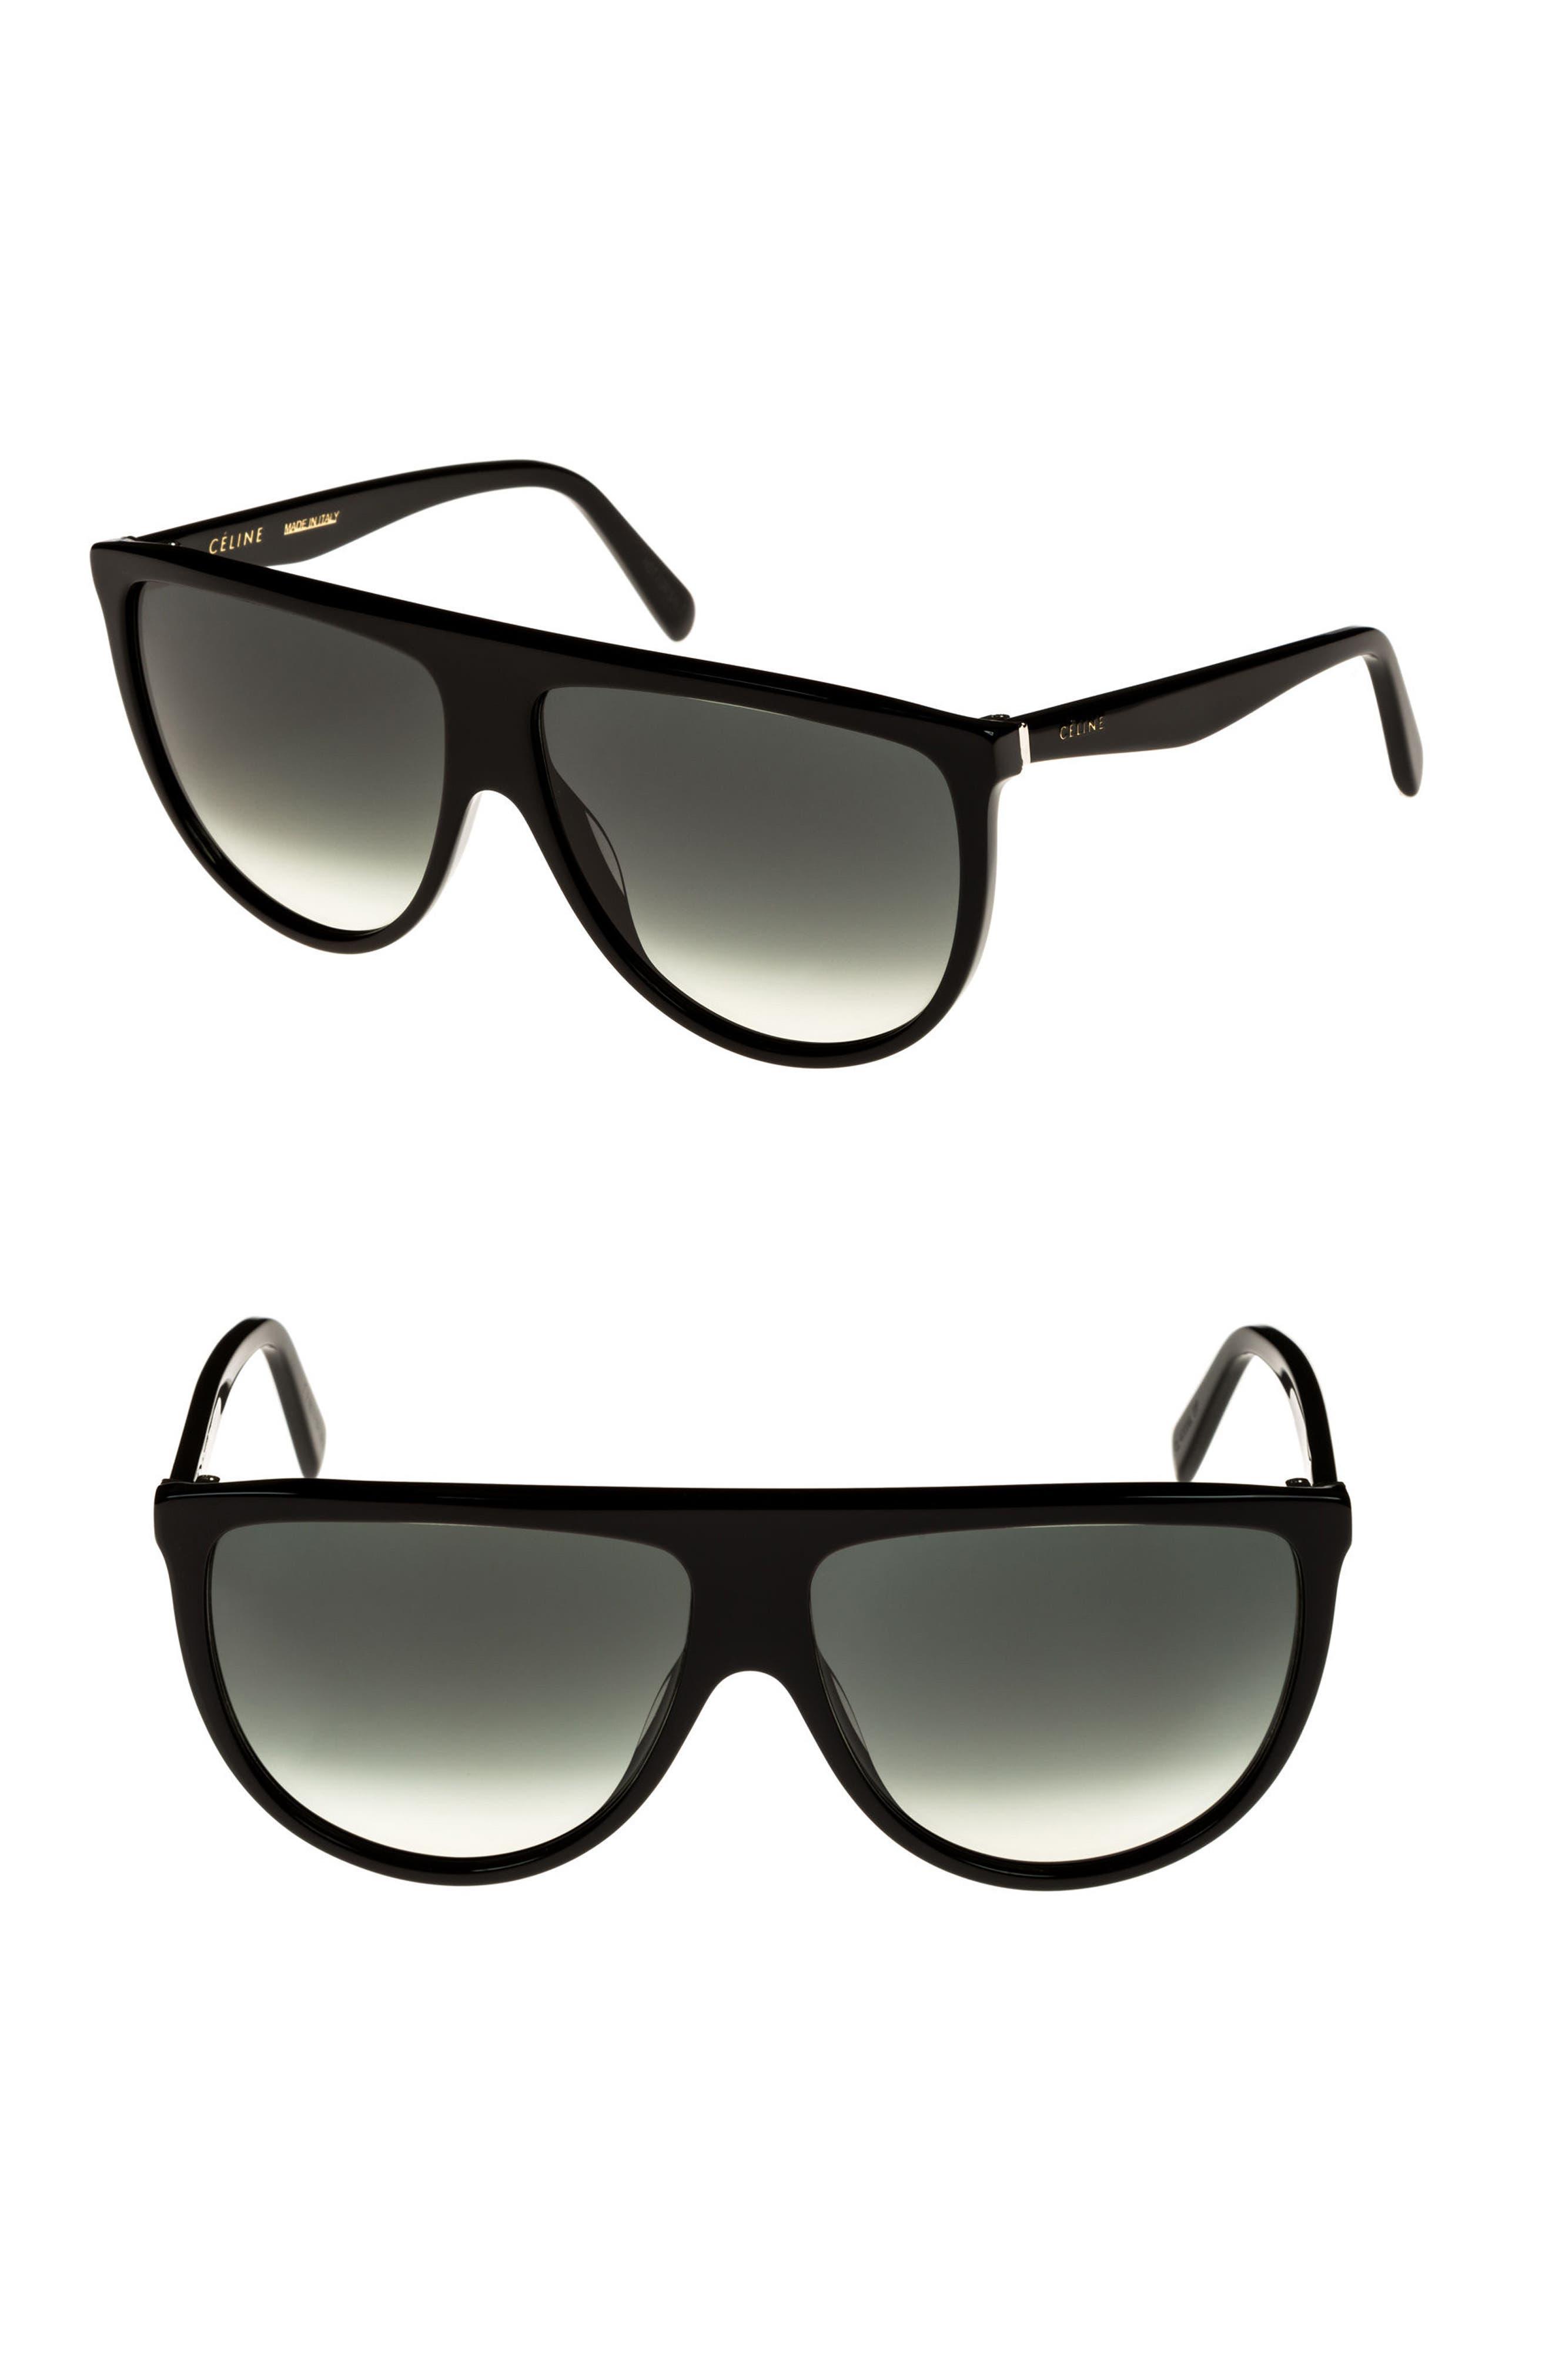 62mm Pilot Sunglasses,                             Main thumbnail 1, color,                             Black/ Green